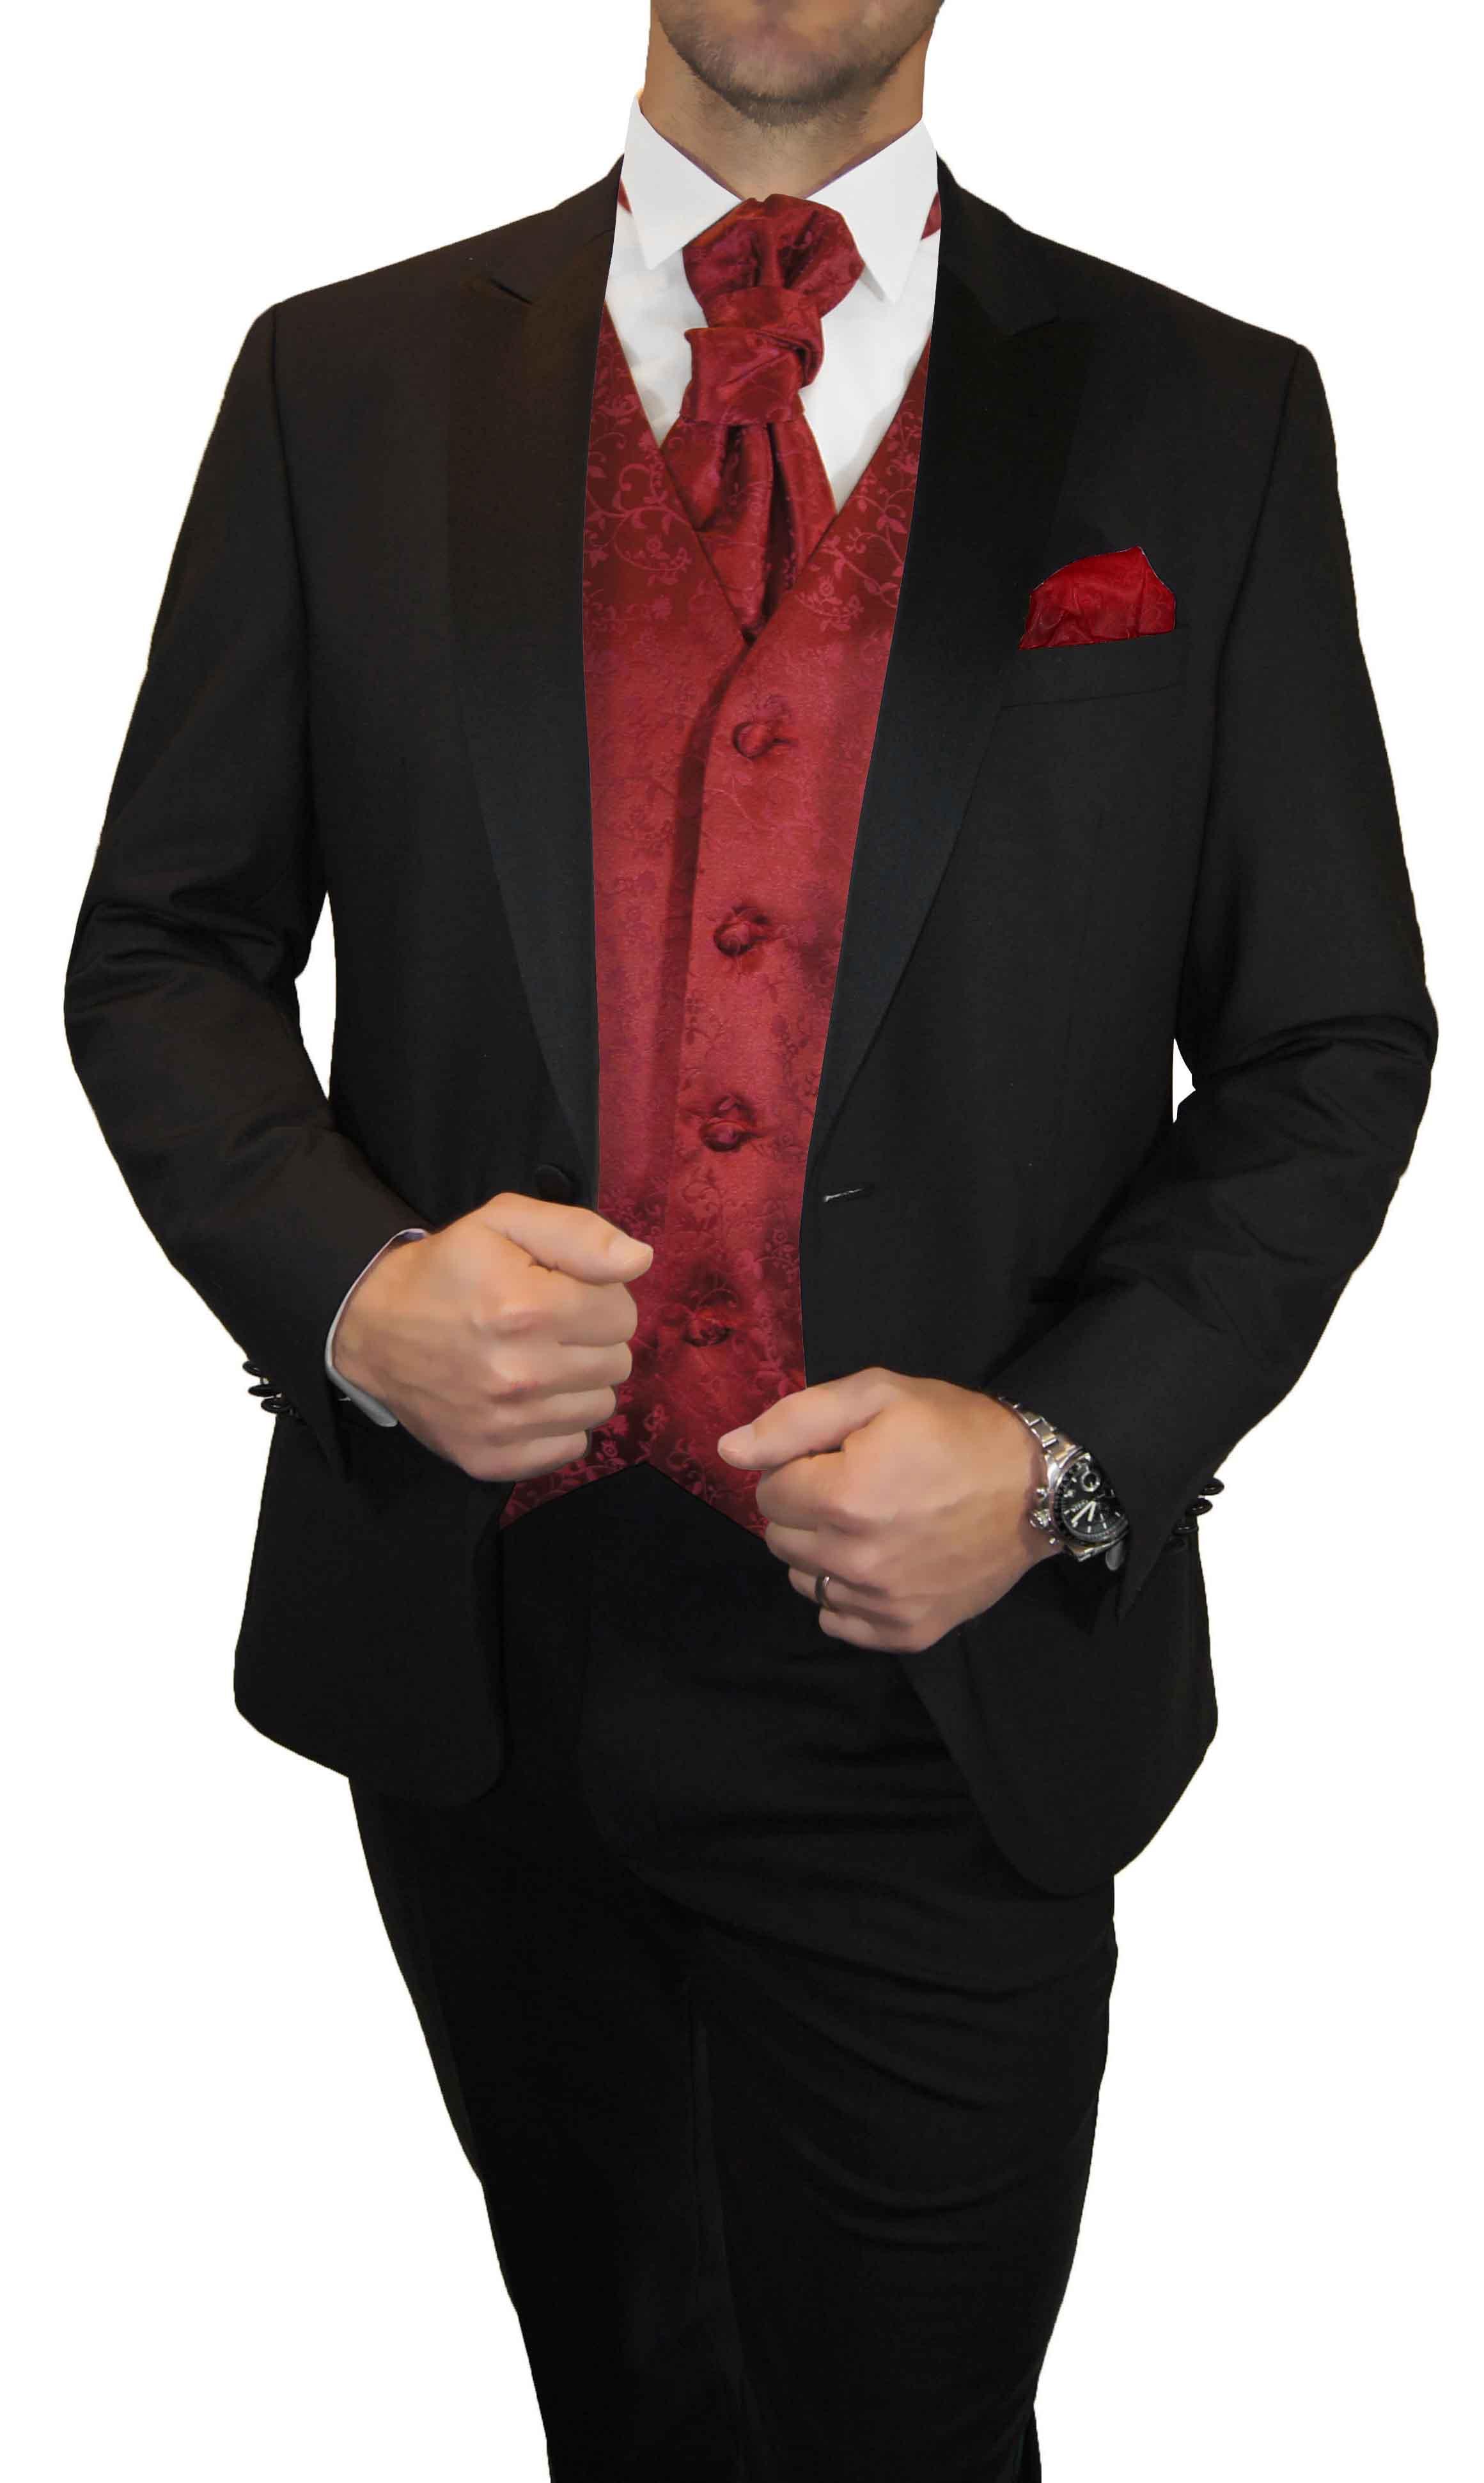 Hochzeitsanzug 6tlg schwarz + Weste rot floral Paul Malone